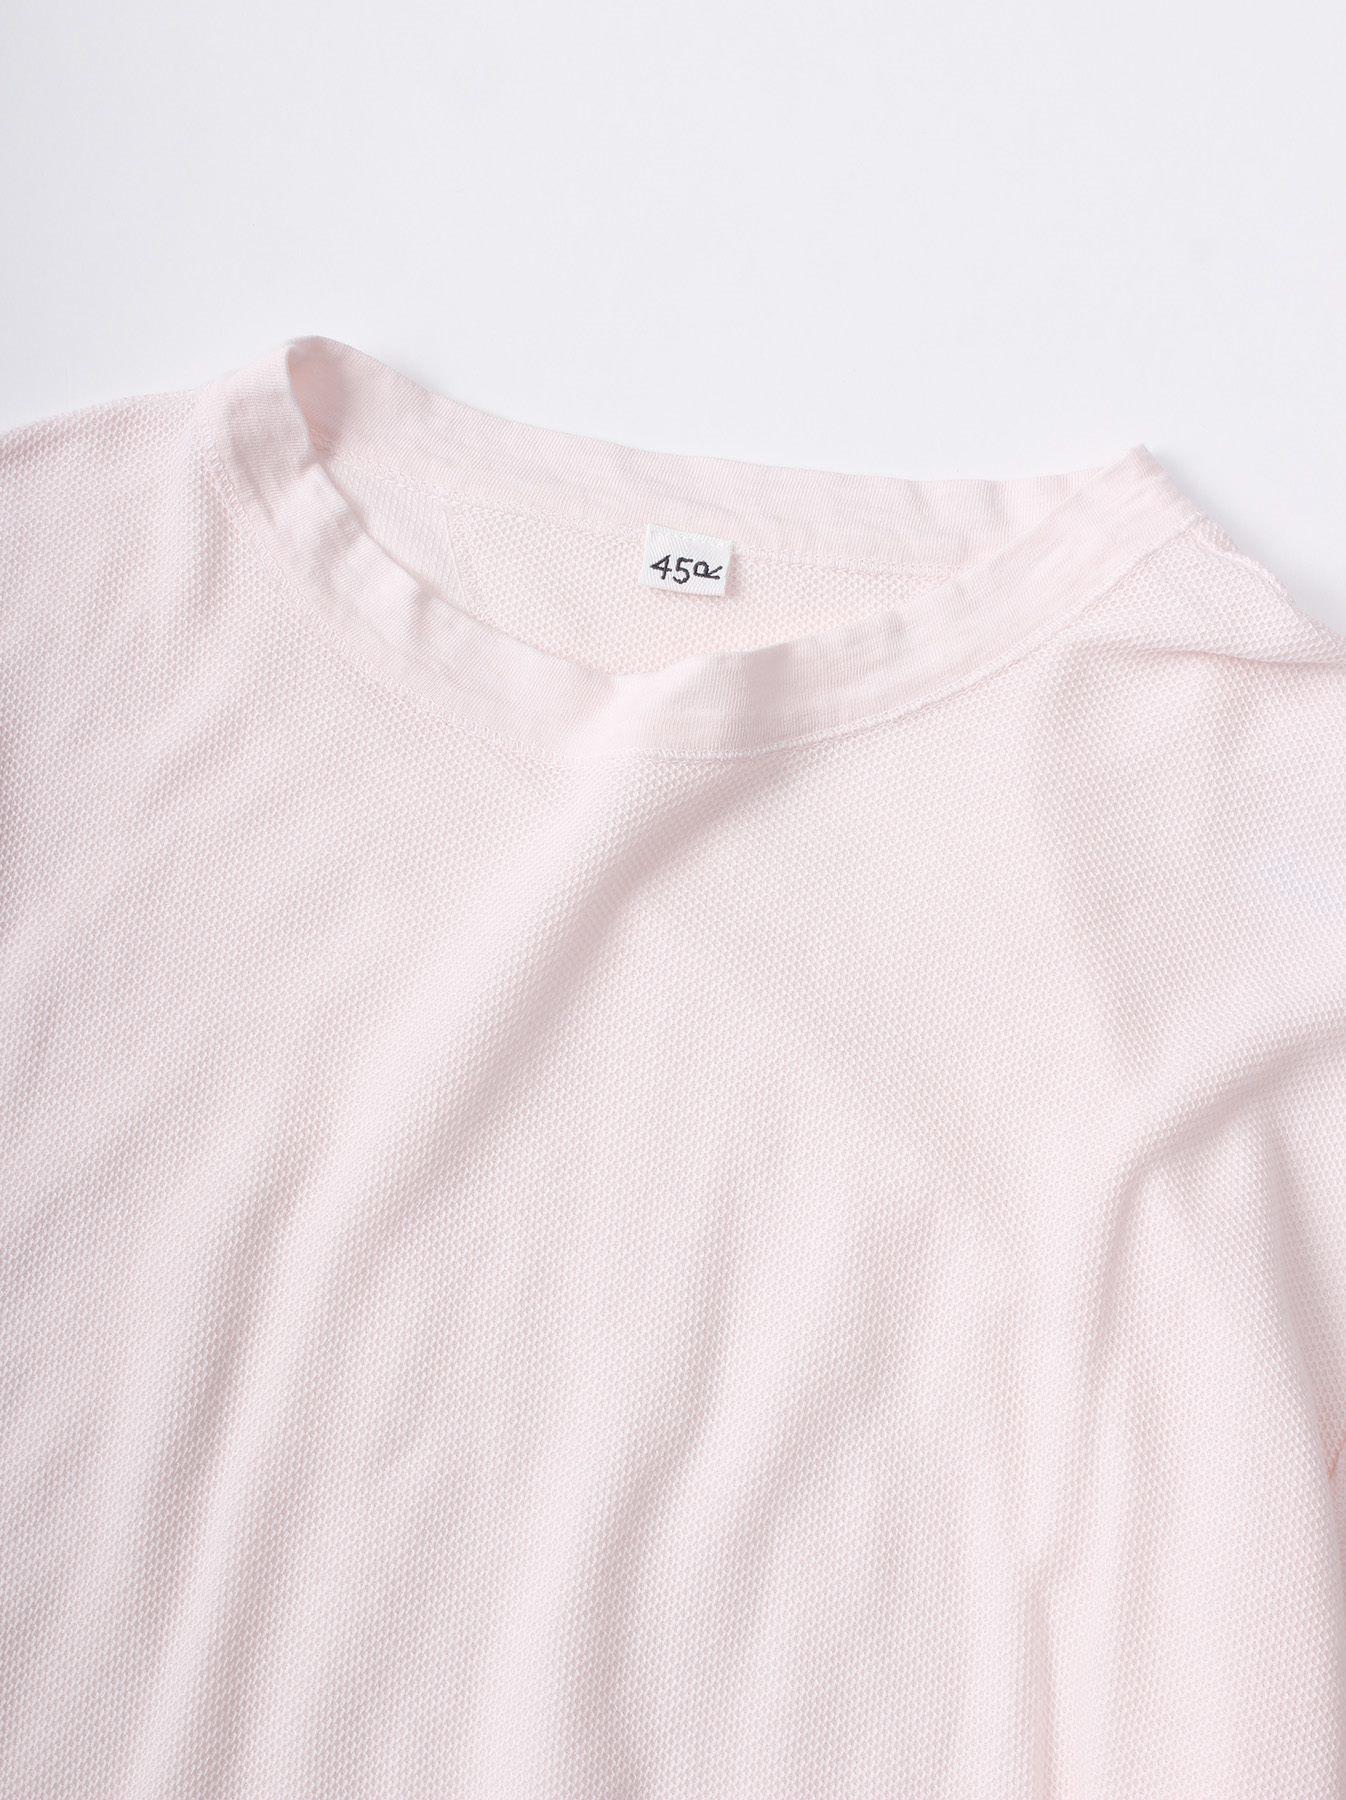 WH Ultimate Pique T-shirt-7